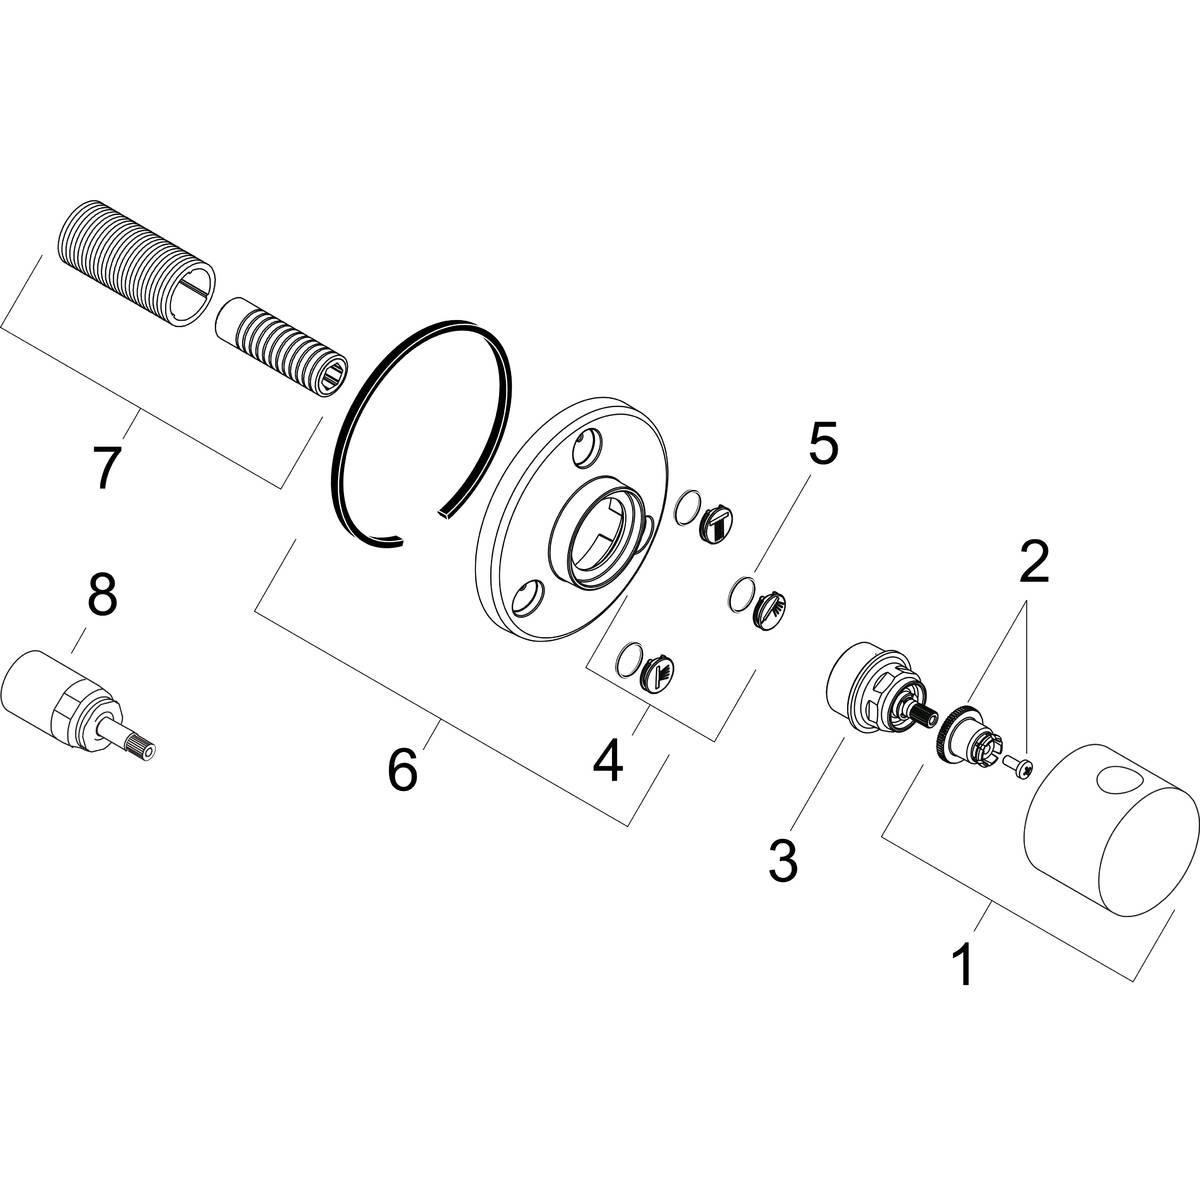 hansgrohe Shut-off and diverter valves: Shut-off